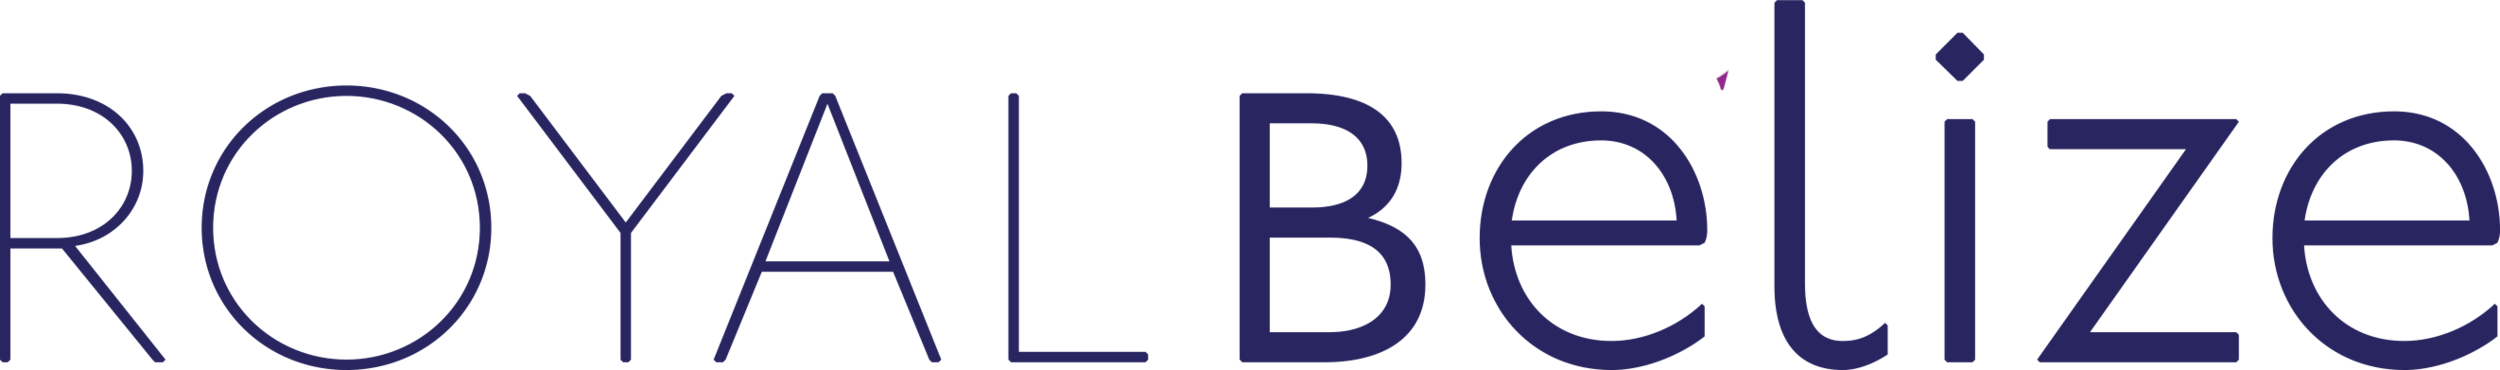 Royal Belize TEXT Logo.png